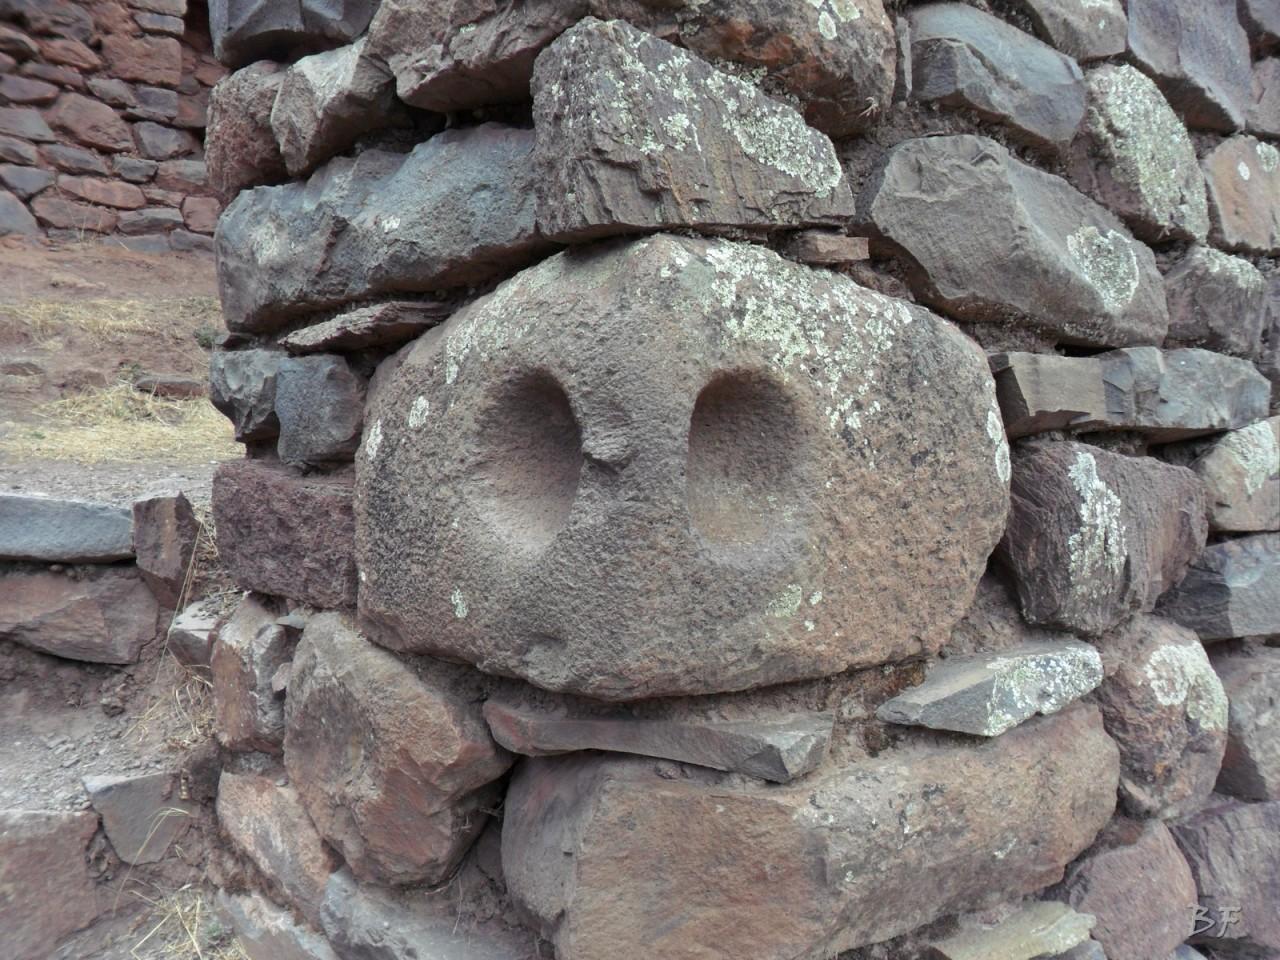 Mura-Poligonali-Megaliti-Altari-Rupestri-Pisac-Cusco-Perù-18